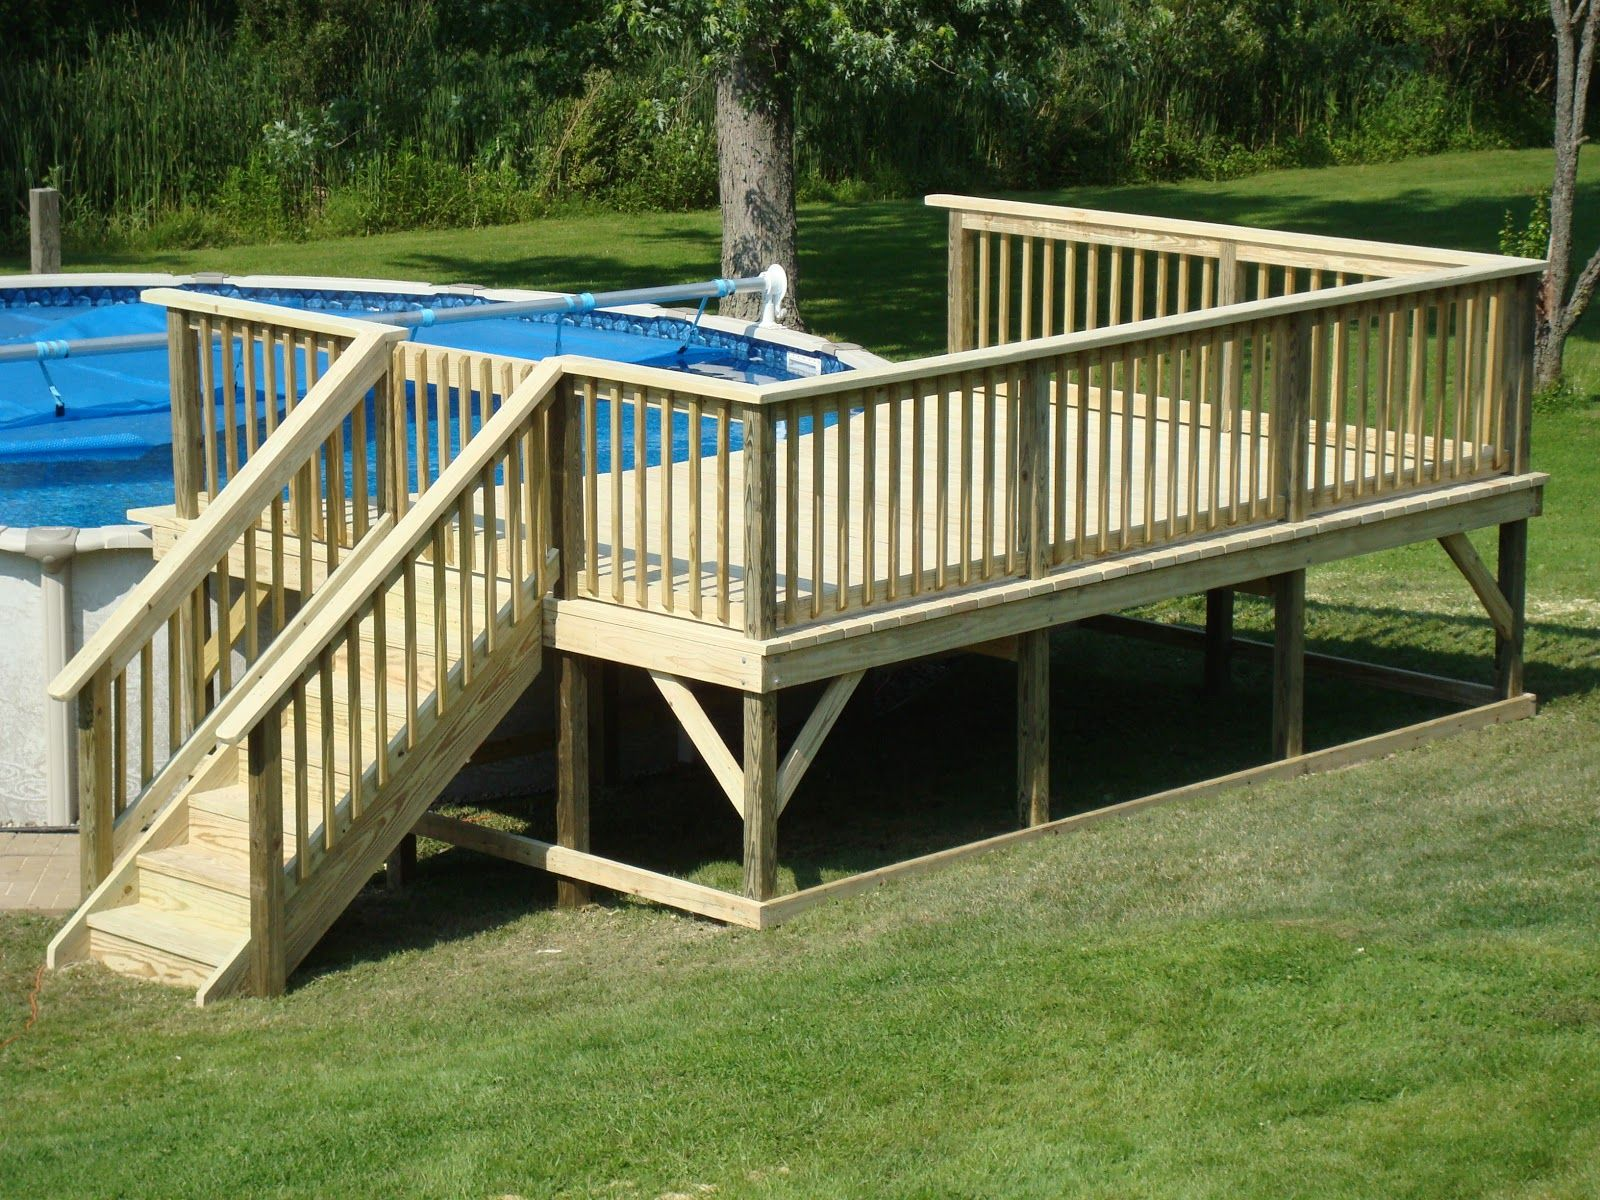 12x16 Skyshot Jpg 1600 1200 Pool Deck Plans Decks Around Pools Above Ground Pool Decks